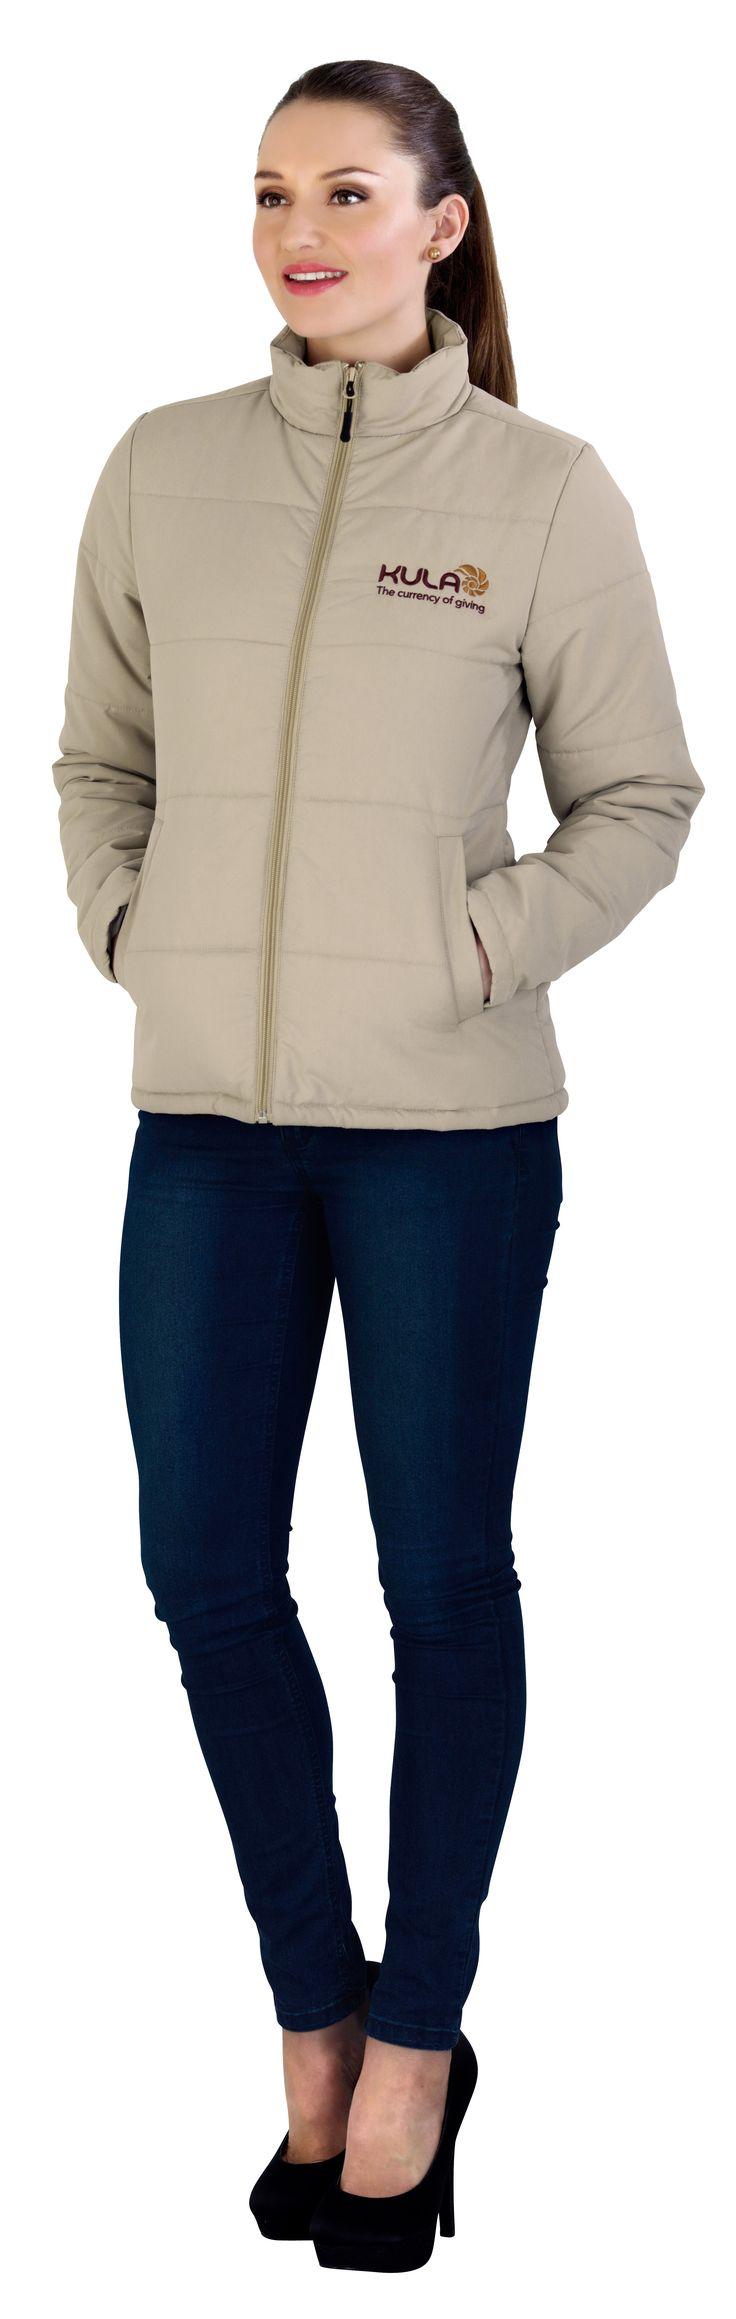 Rego Ladies Padded Jacket